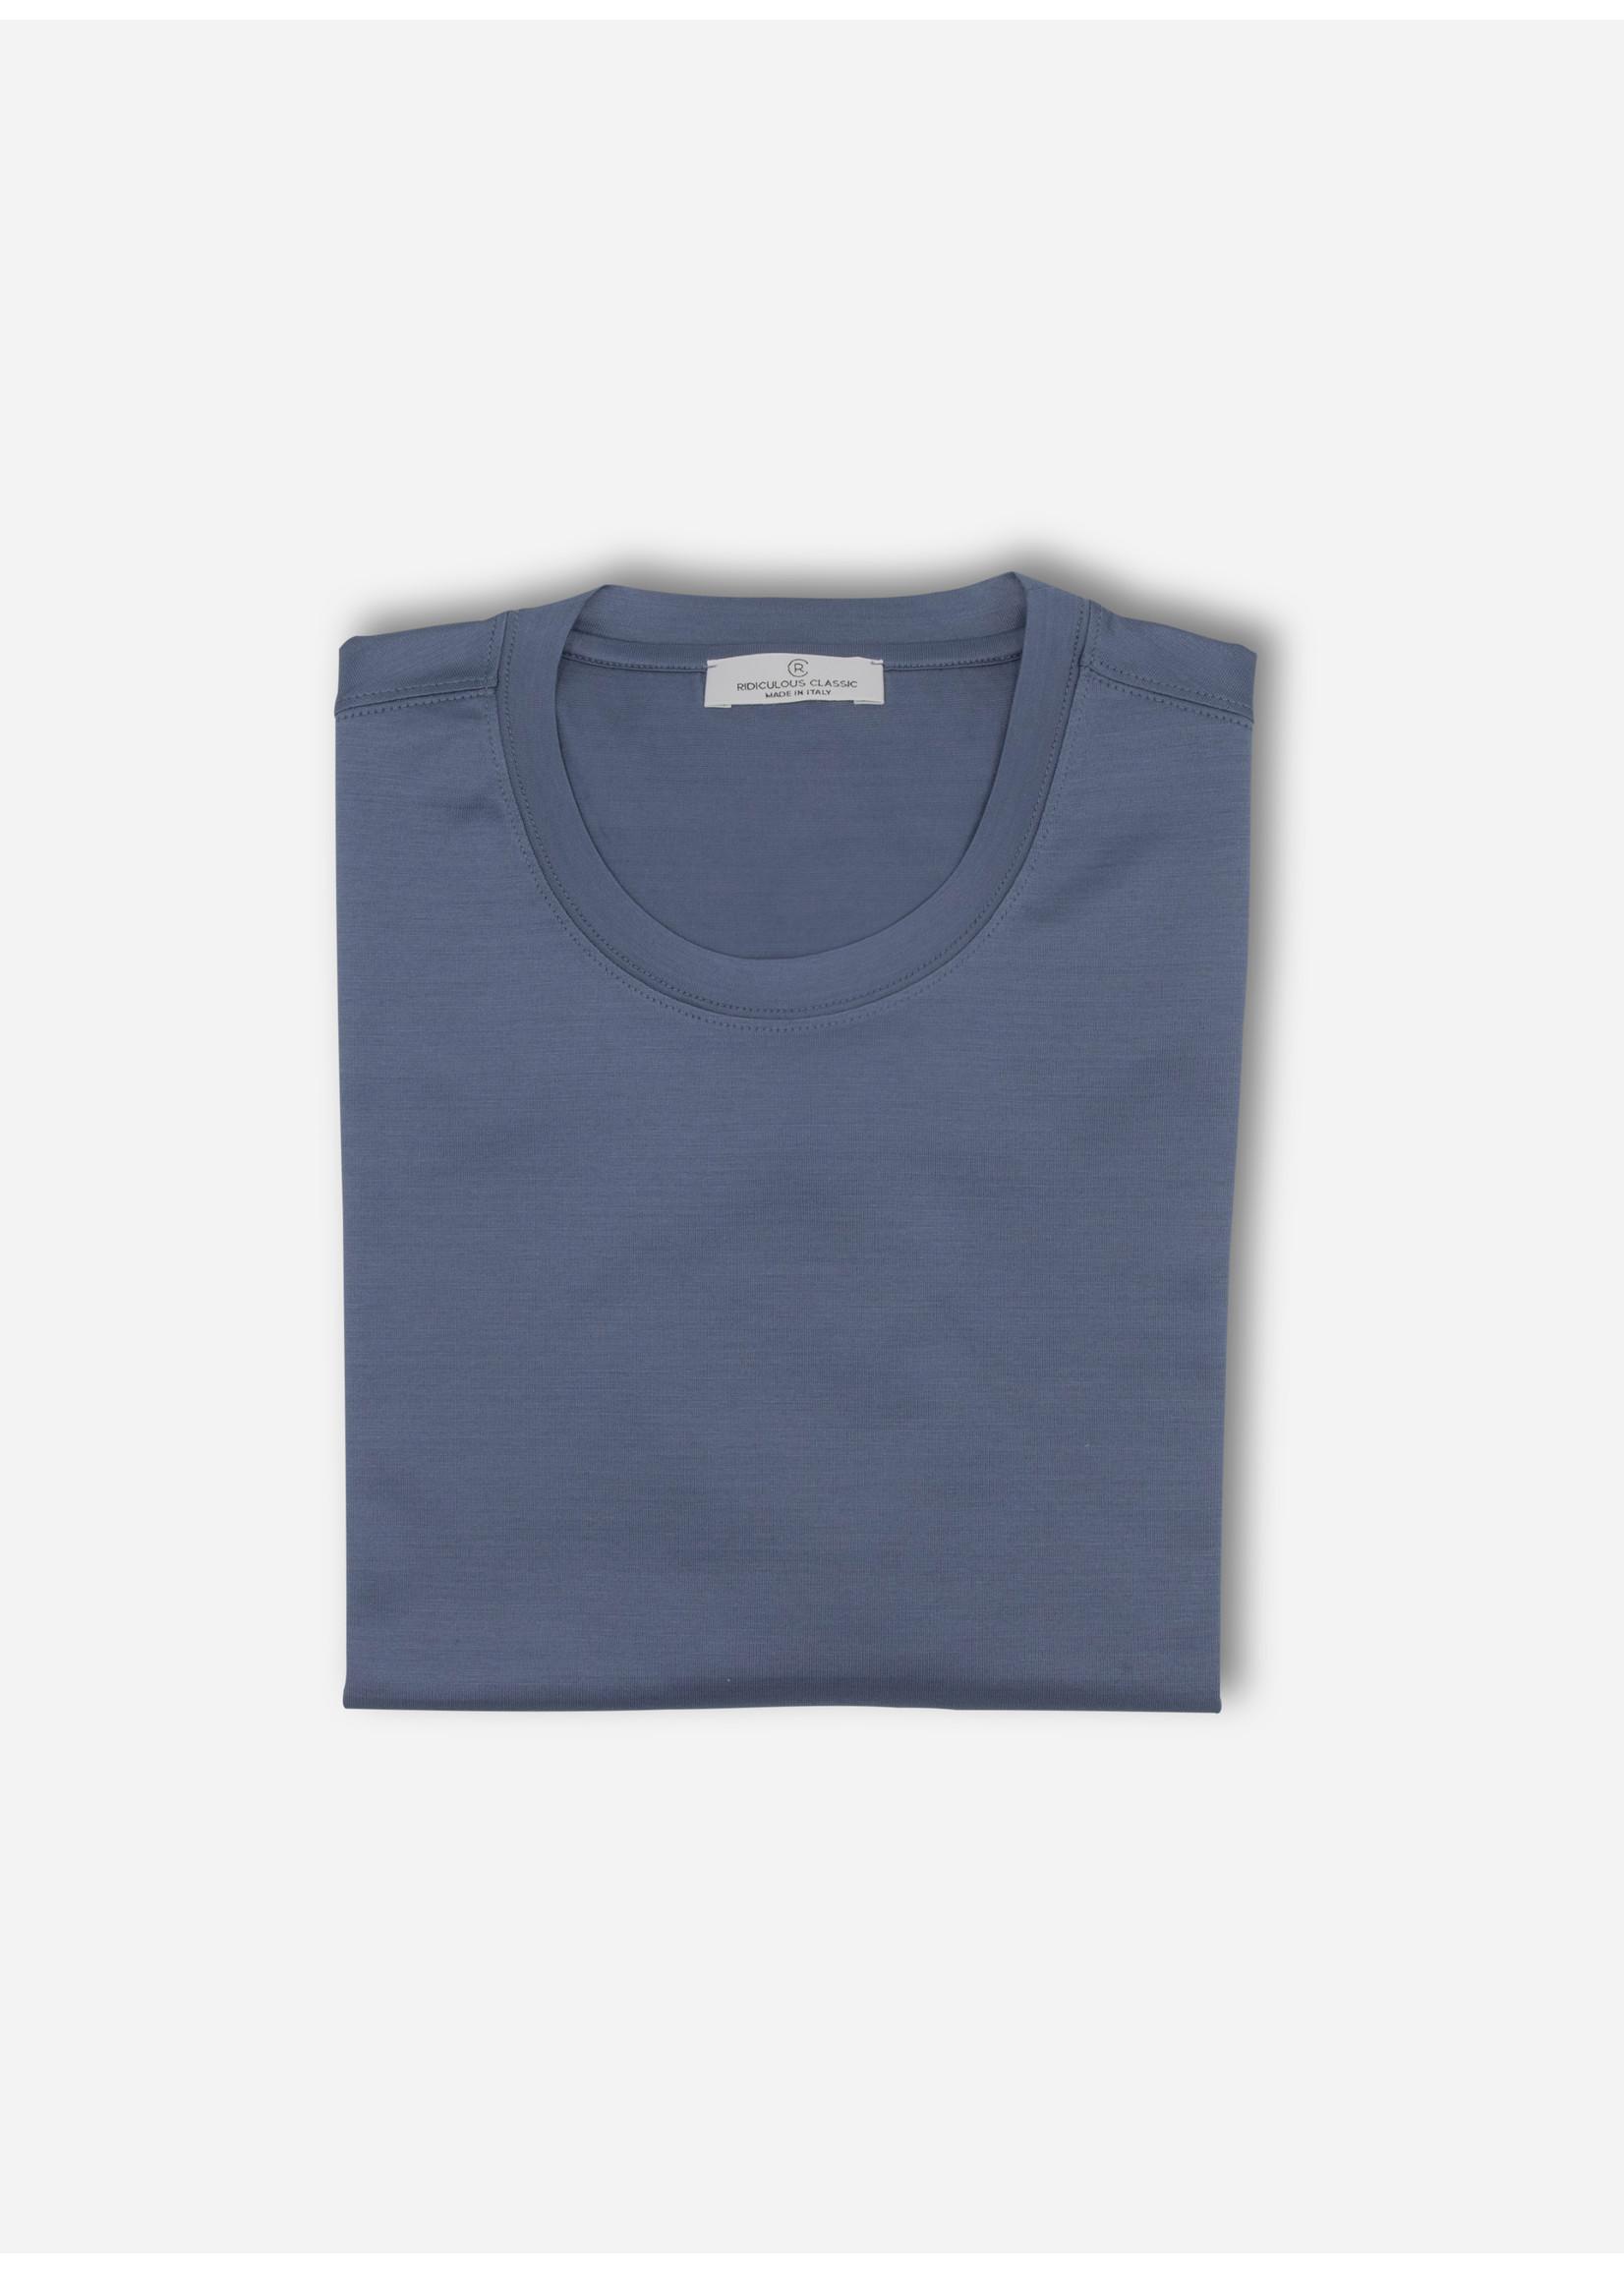 Ridiculous Classic Tshirt north sea